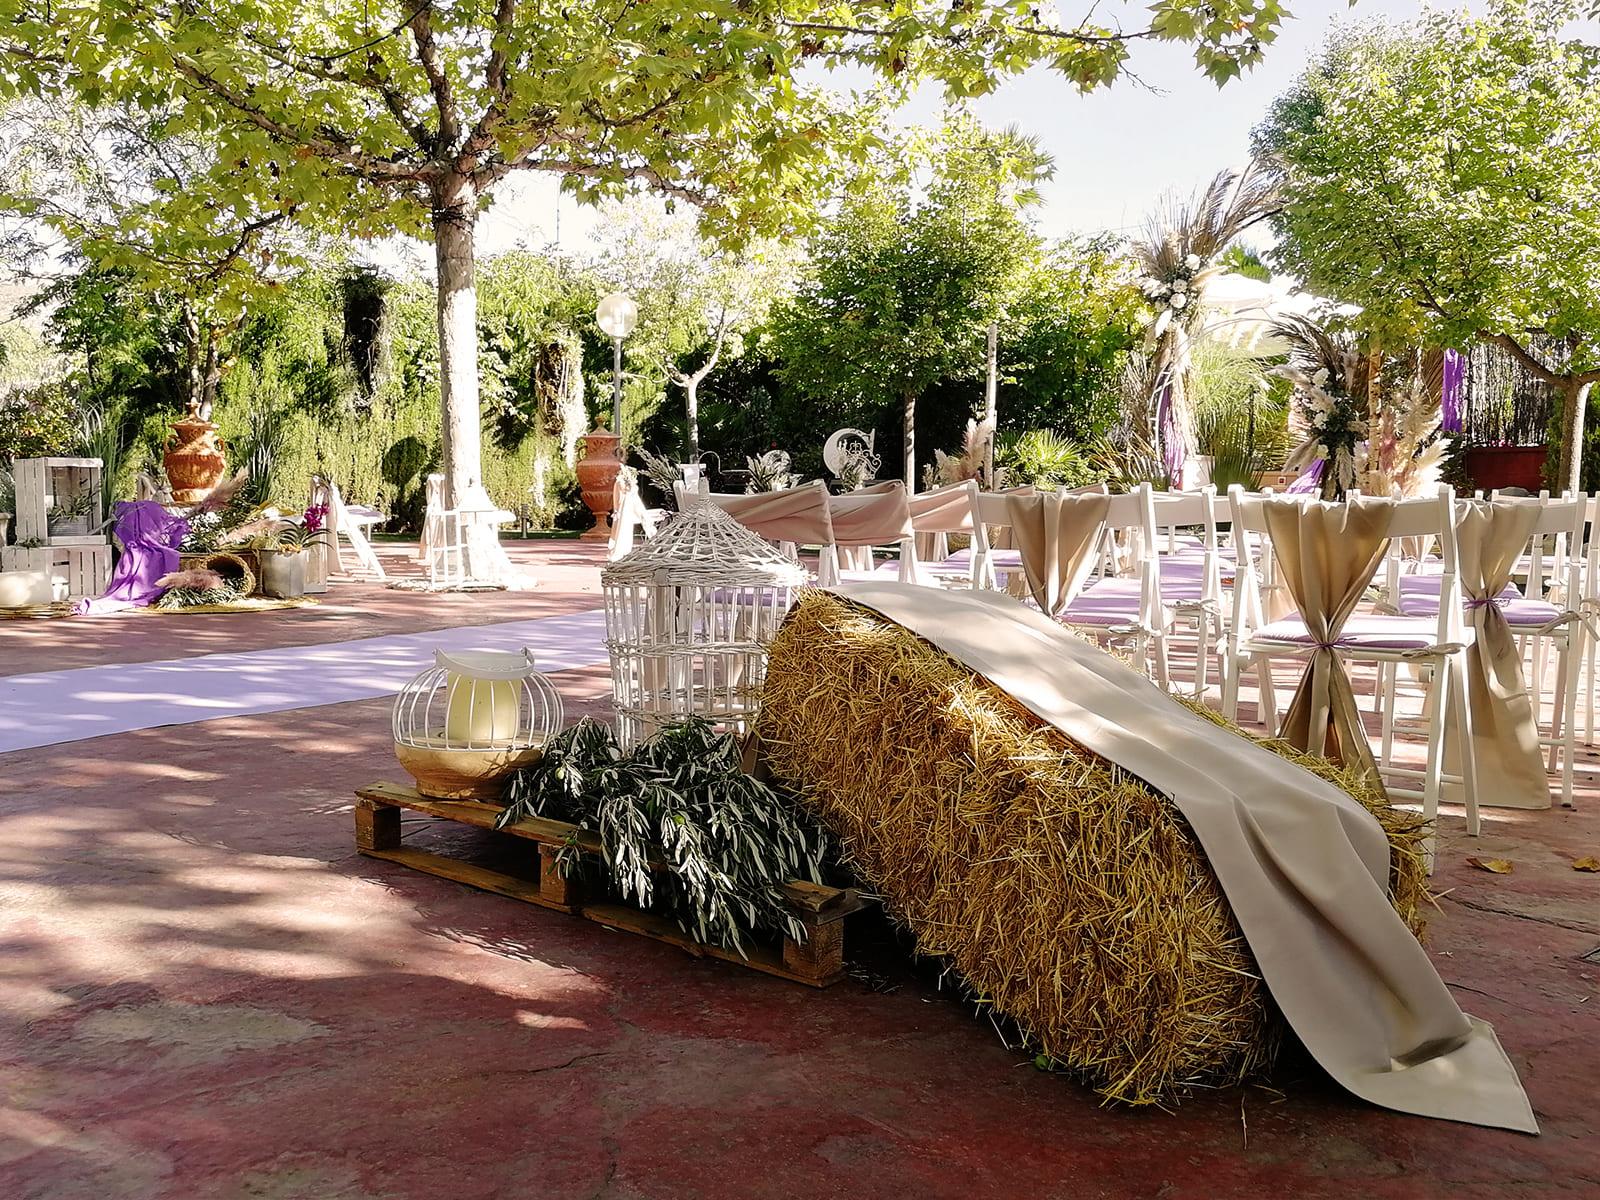 boda-civil-rupestre-personalizada-tonos-morados-SJ-04_HIDROJARDIN-Bañeres